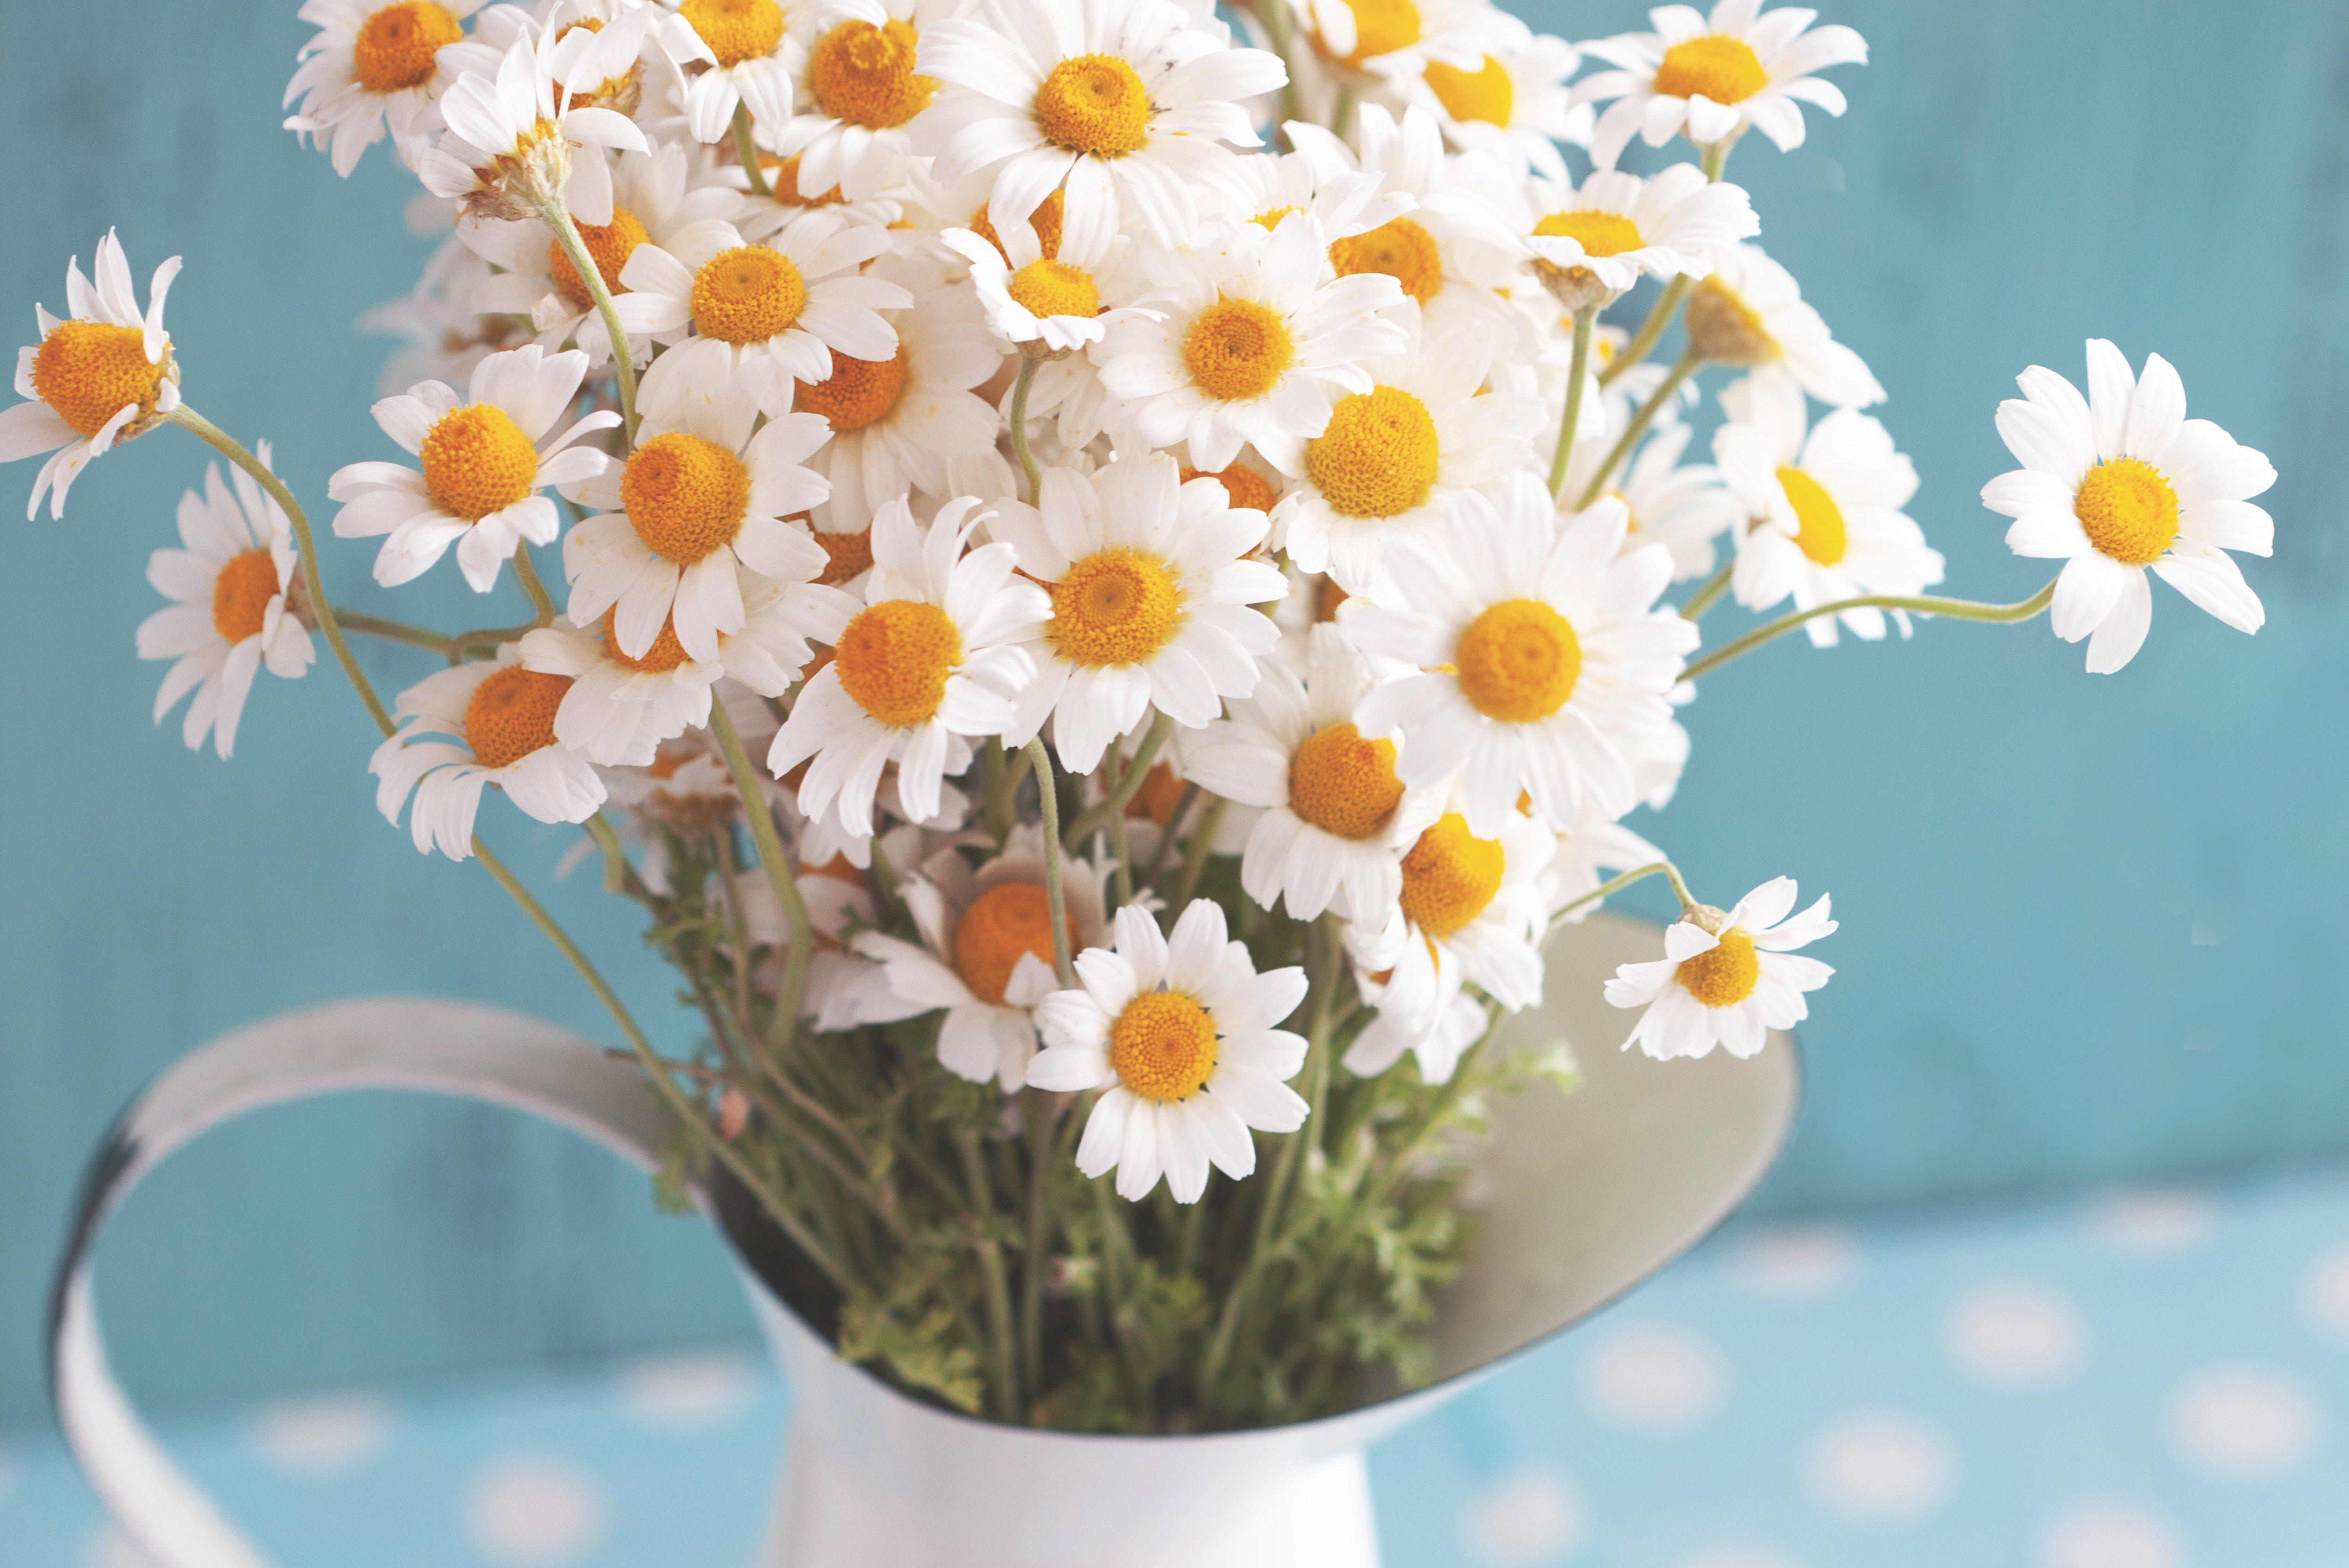 Букет цветов ромашки картинки